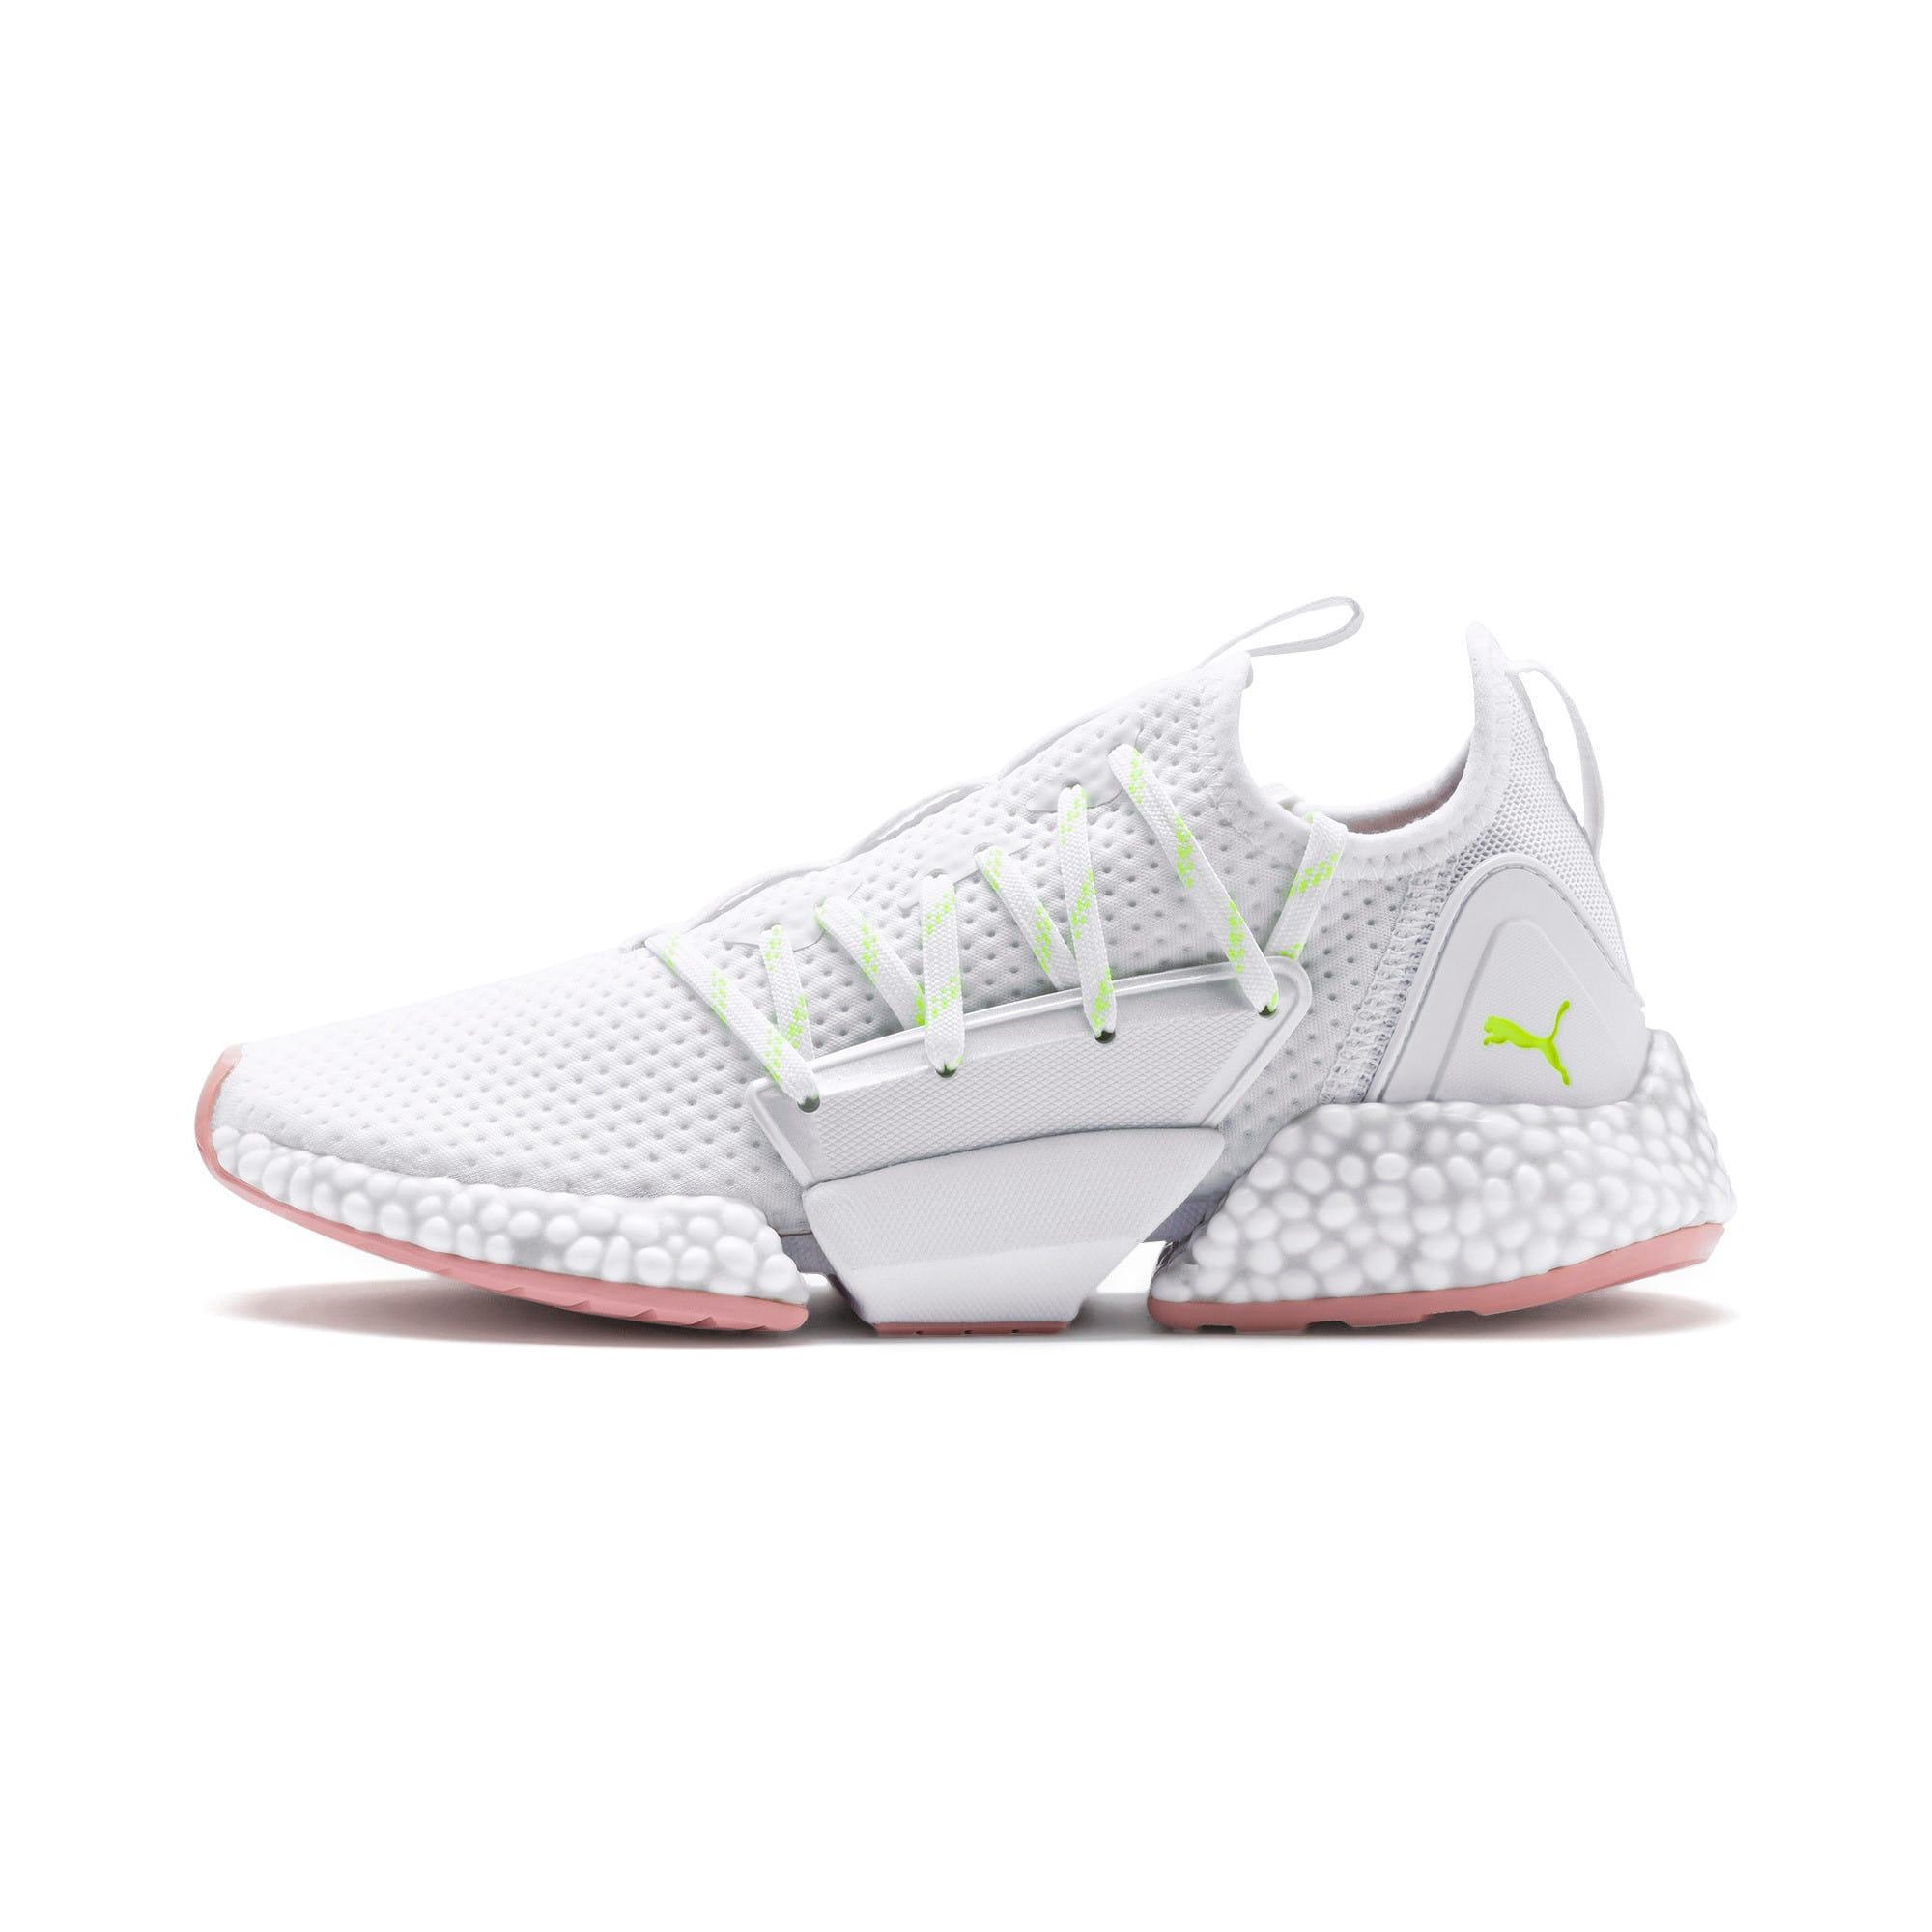 Thumbnail 1 of HYBRID Rocket Aero Women's Running Shoes, Puma White-Bridal Rose, medium